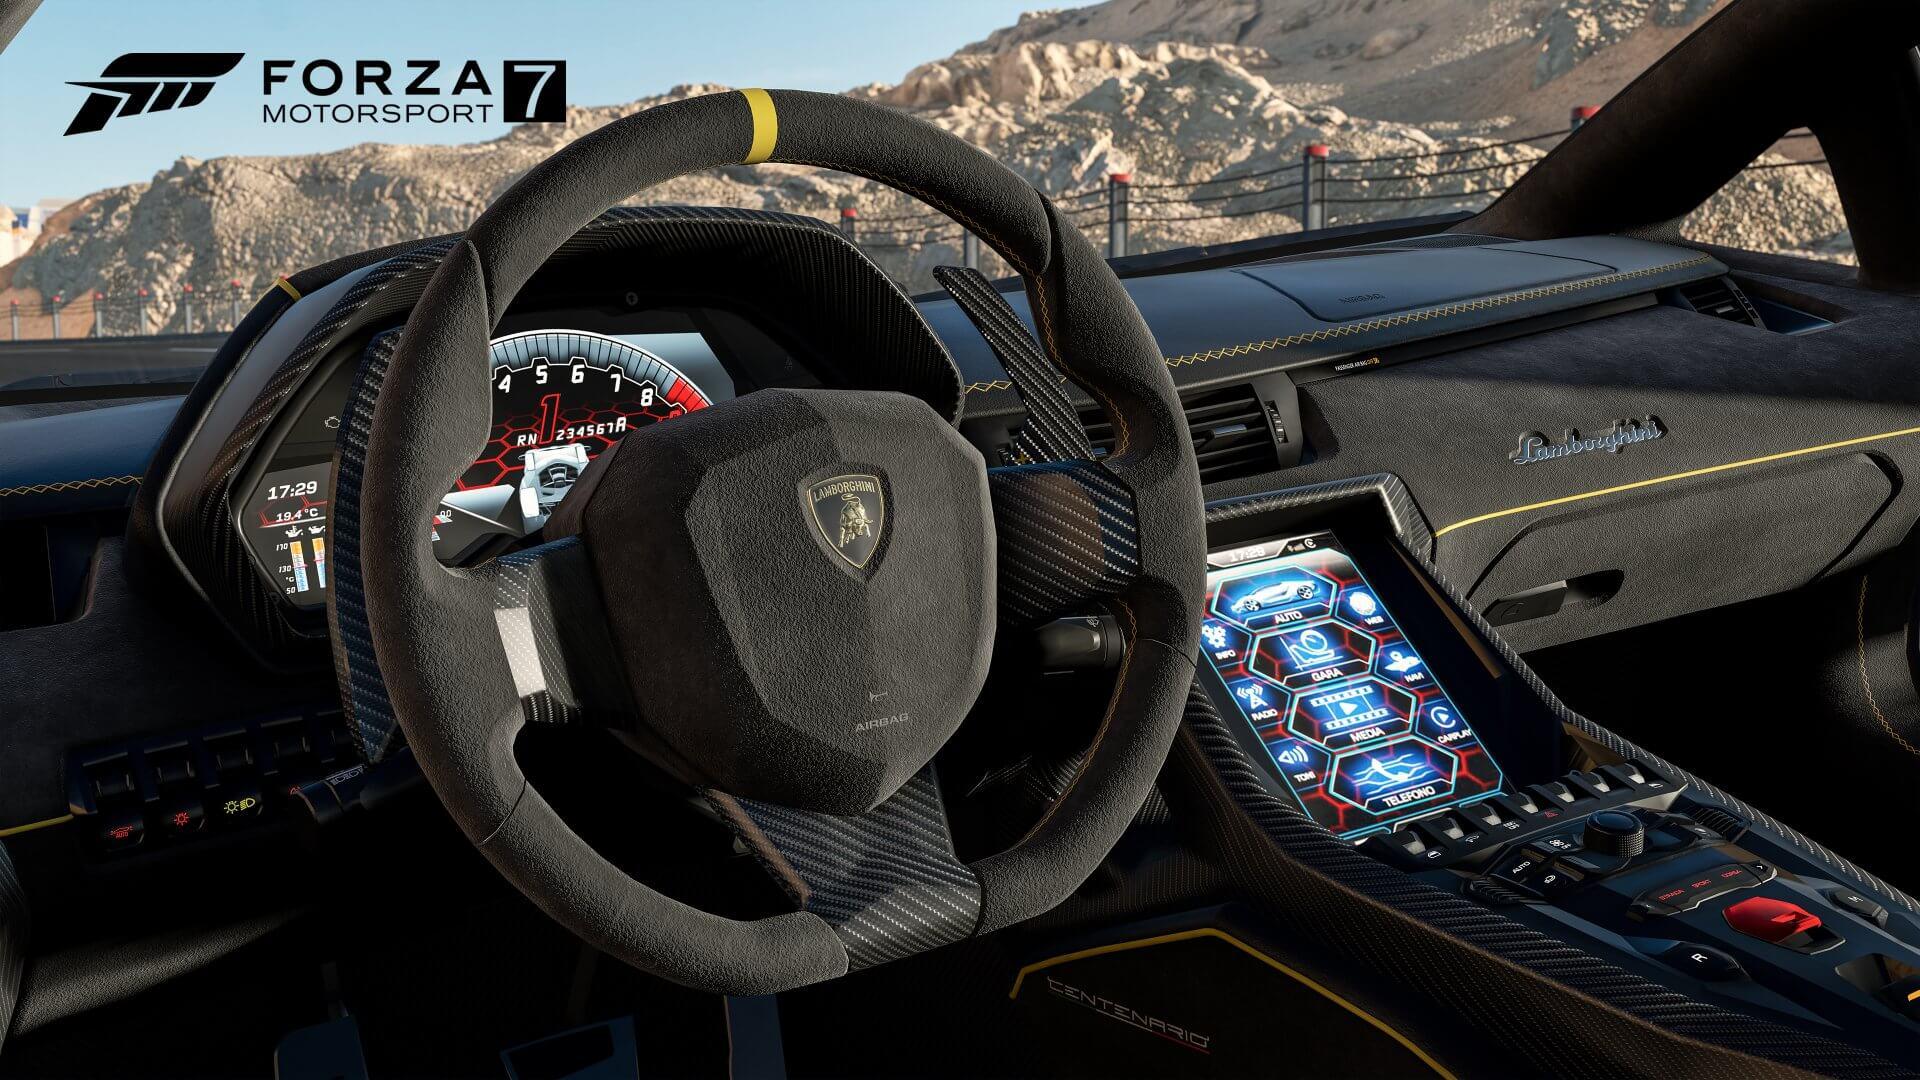 Forza Motorsports 7 download free